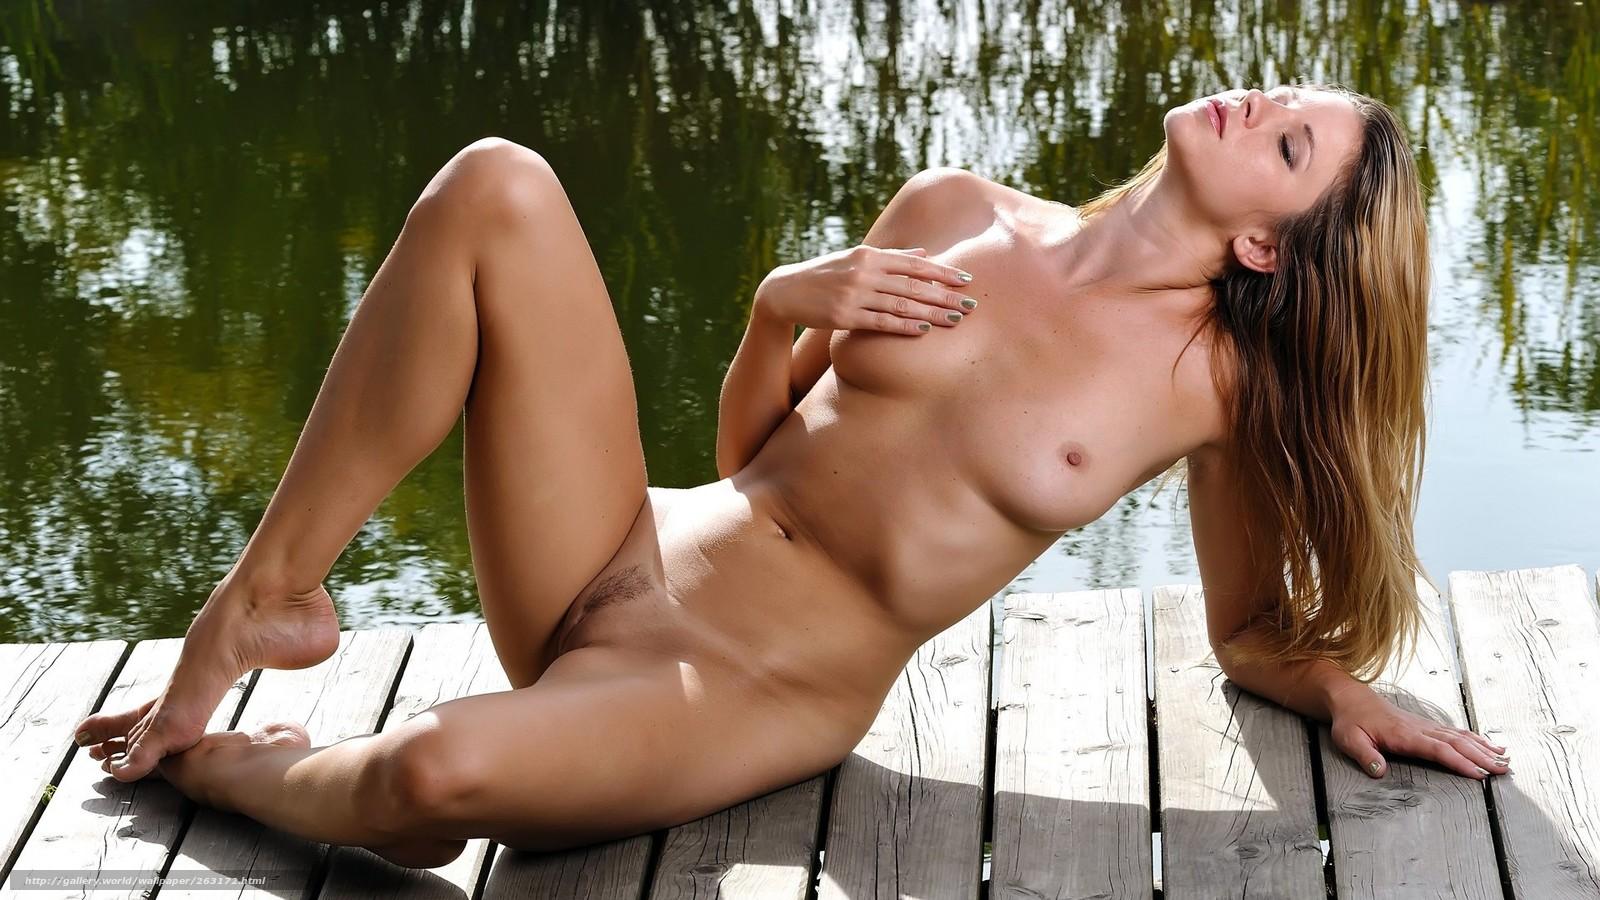 Фото голая девушка hd 20 фотография